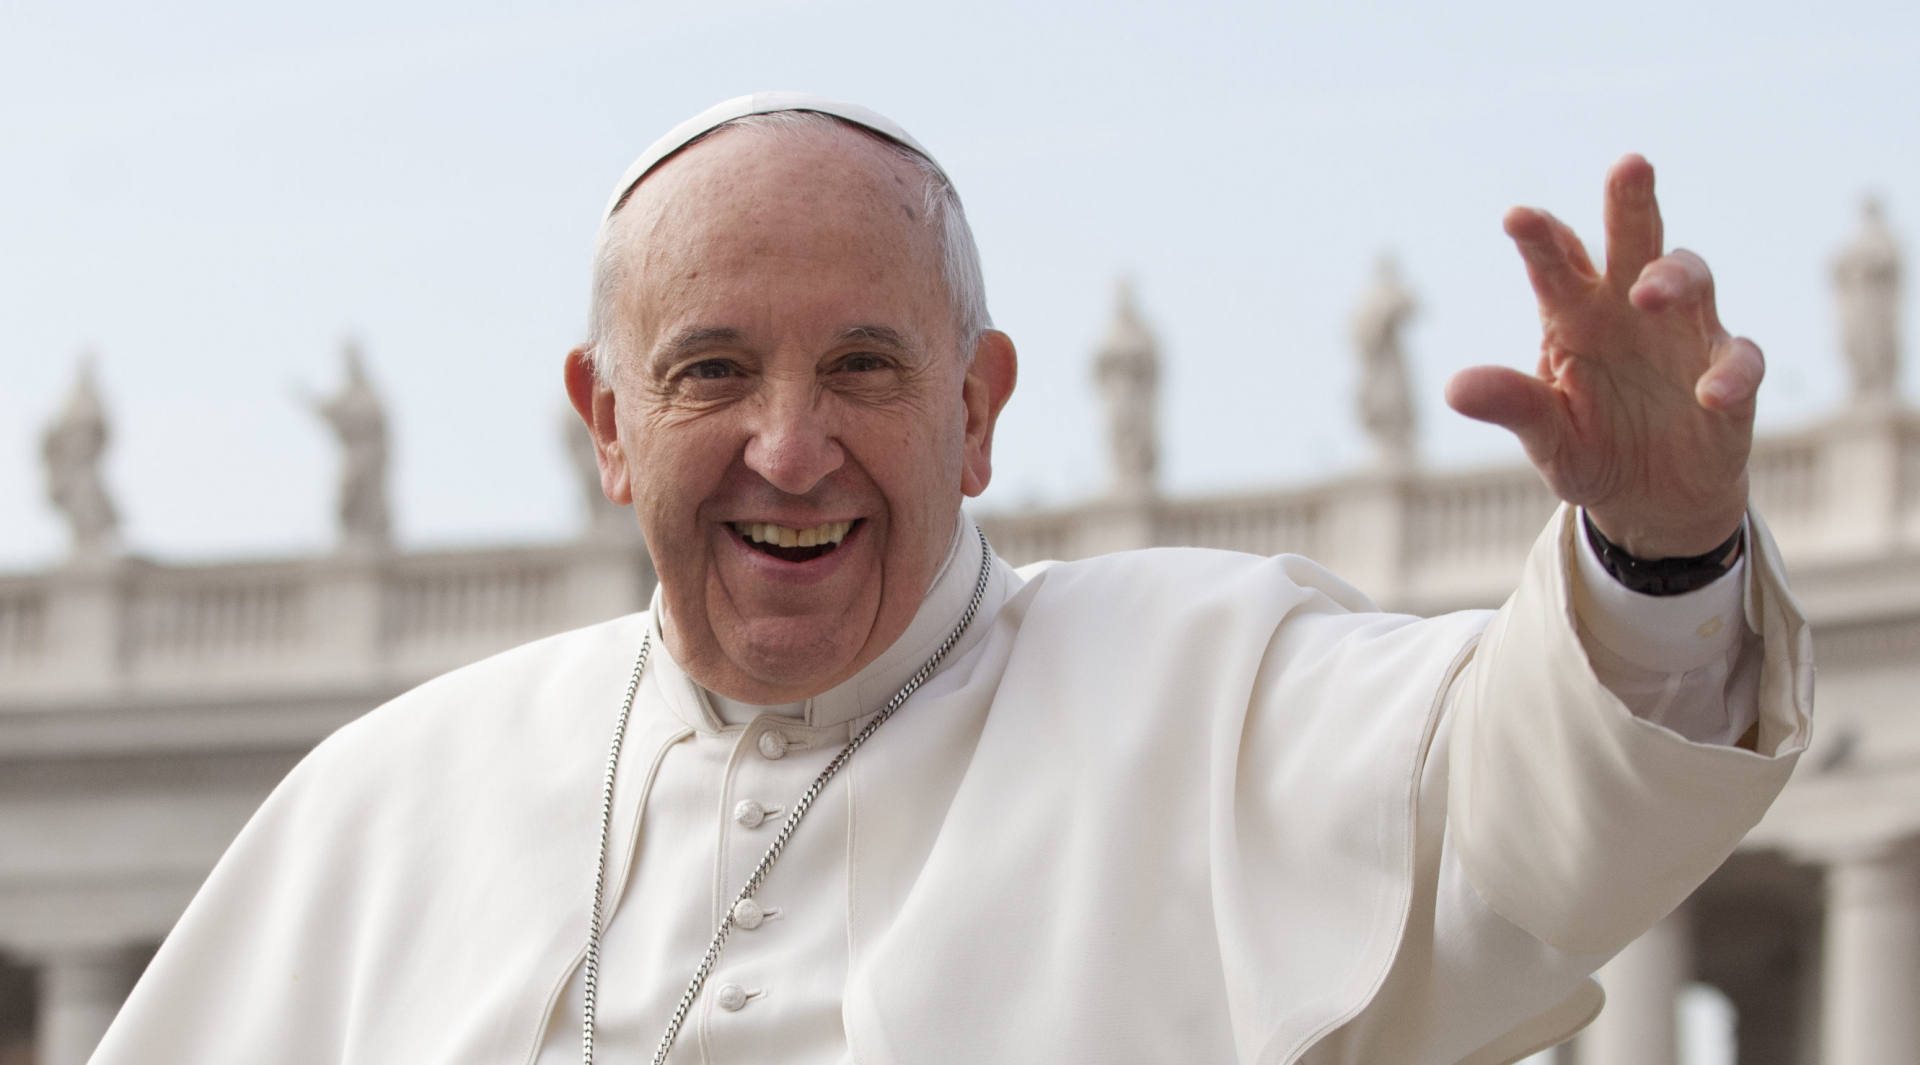 Diretta su Tvl con Papa Francesco